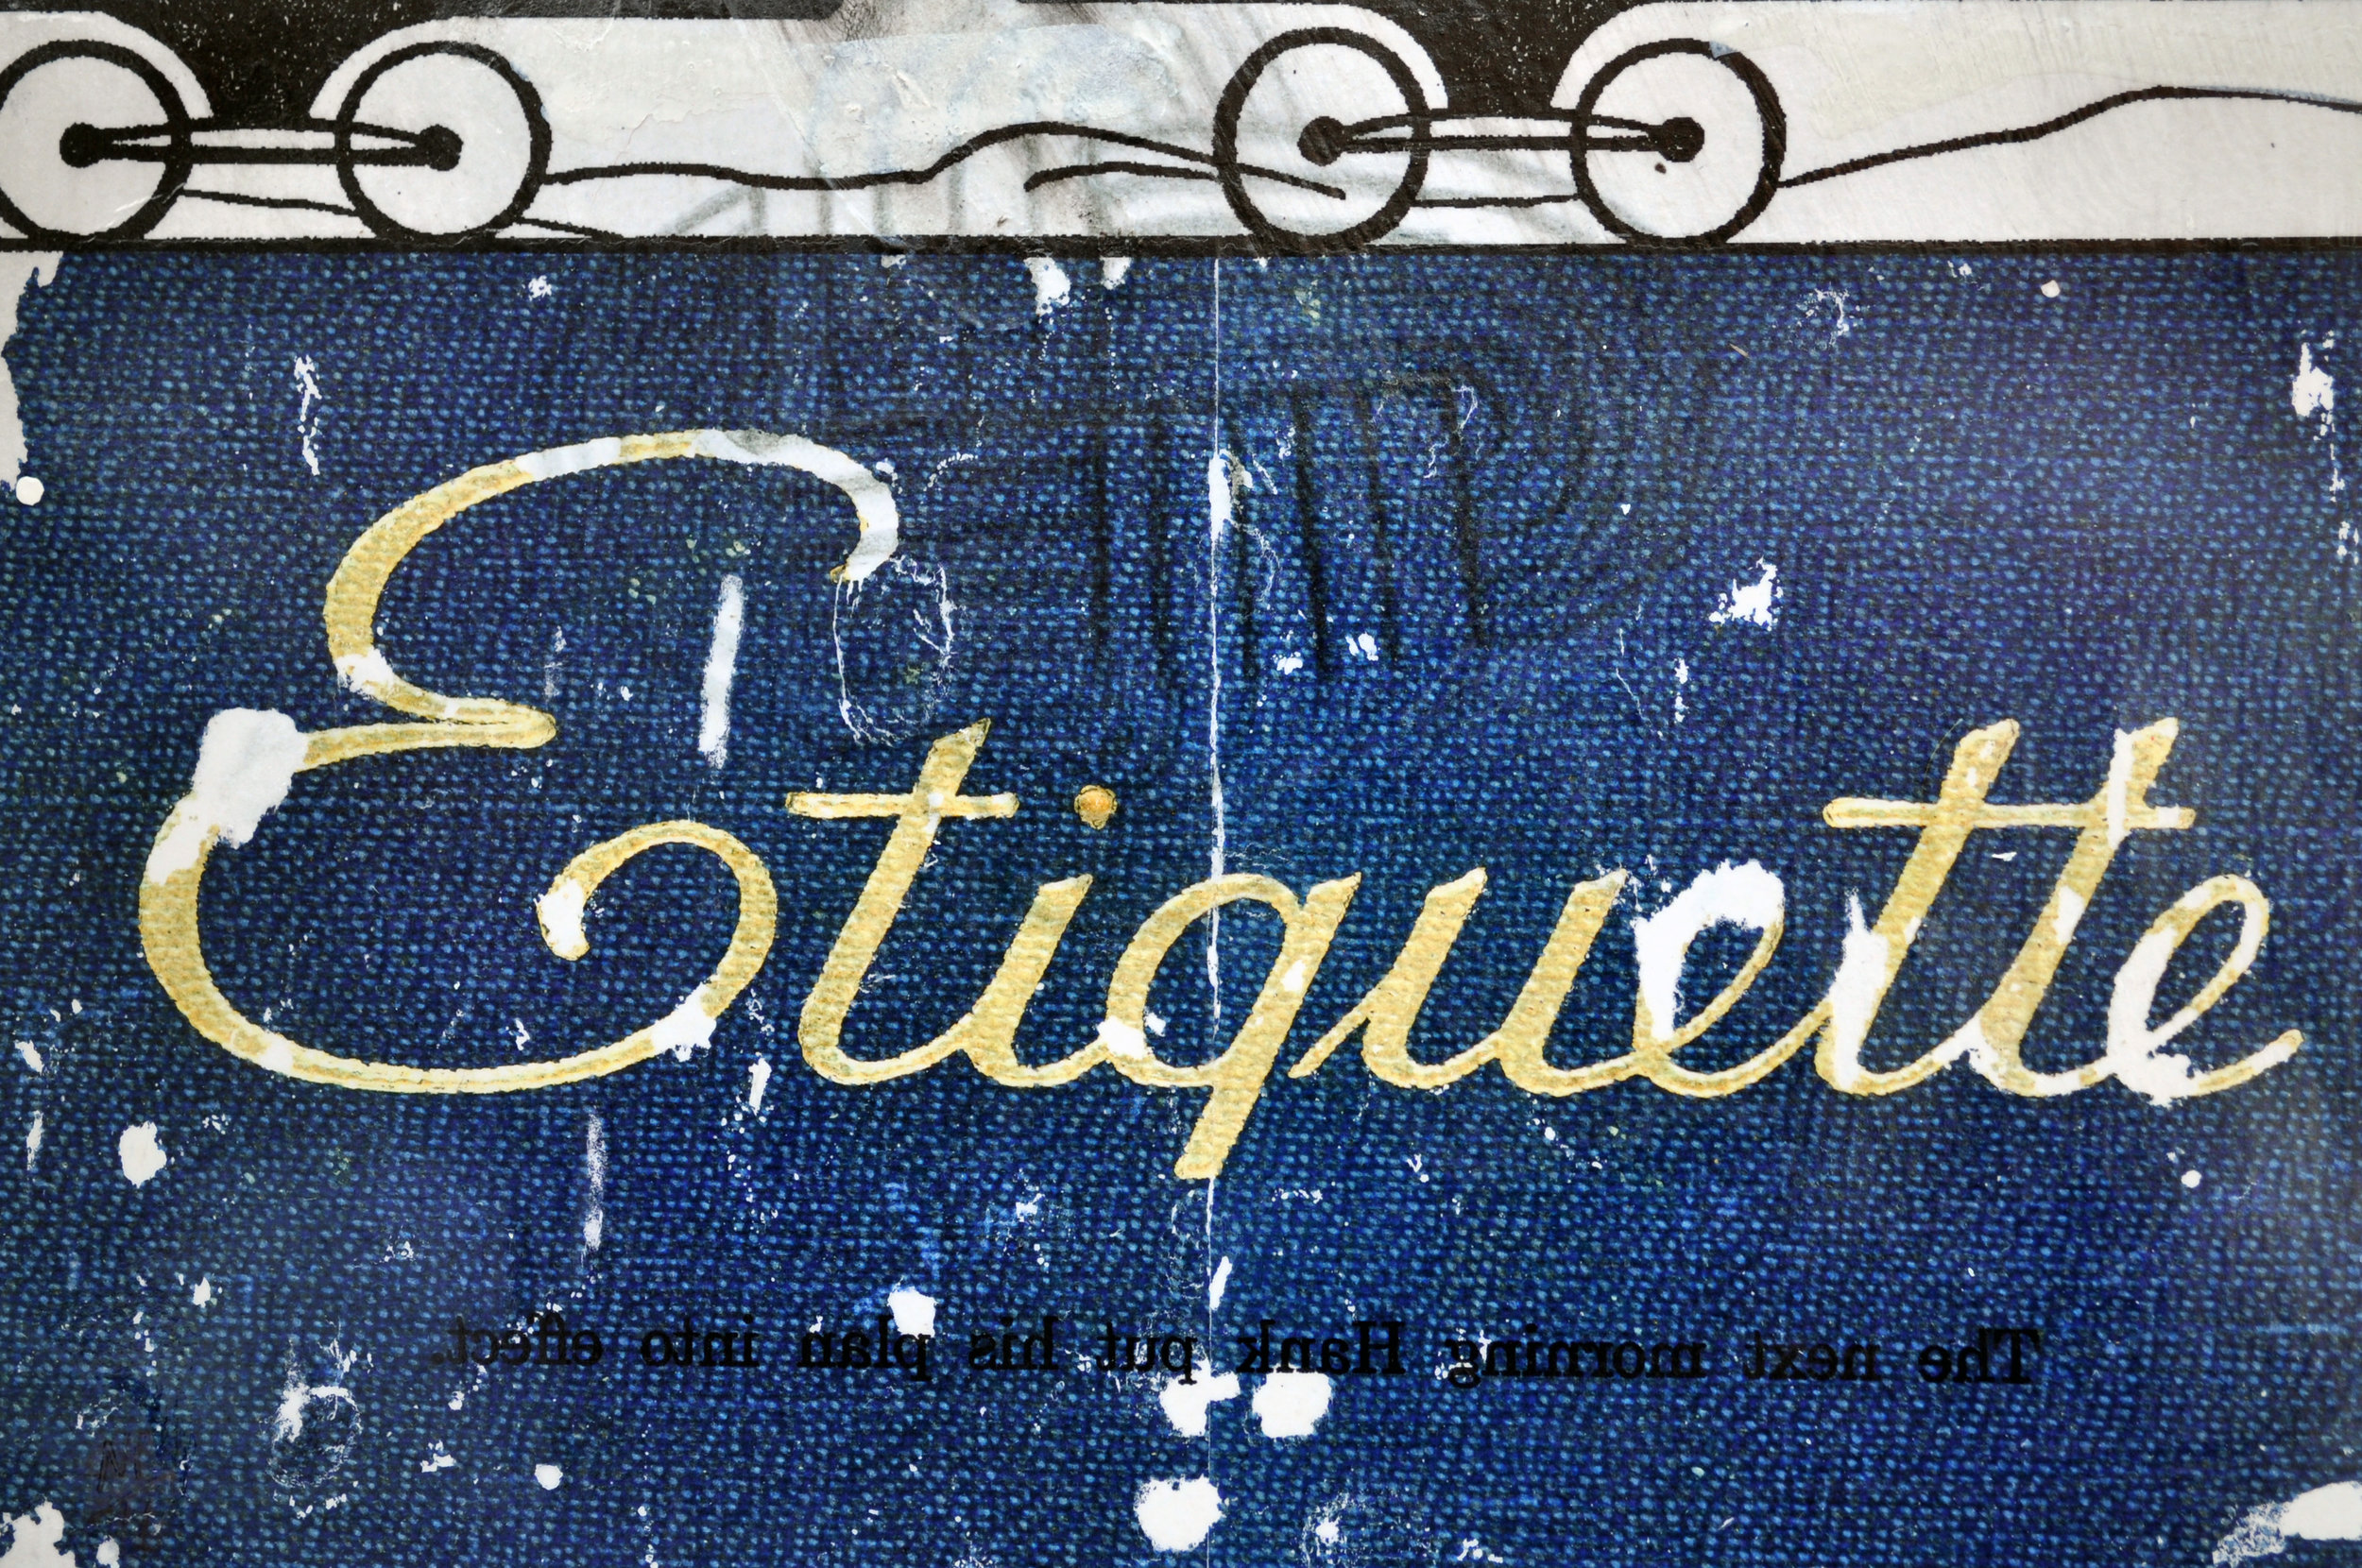 Powell_Etiquette_detail_hr.jpg